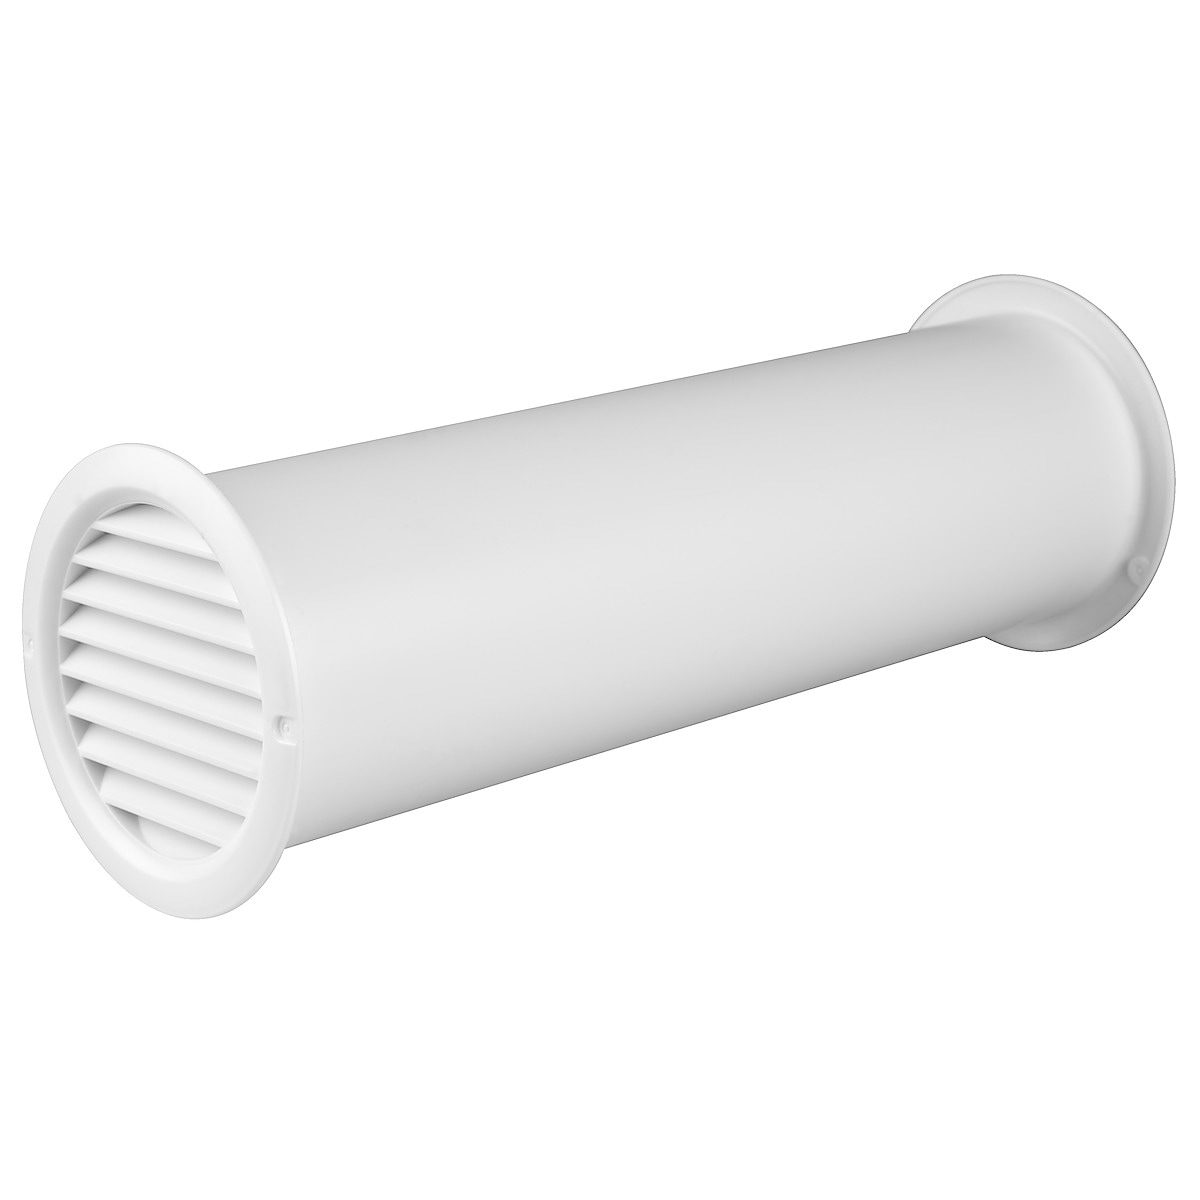 Flexit 100 R friskluftsventil